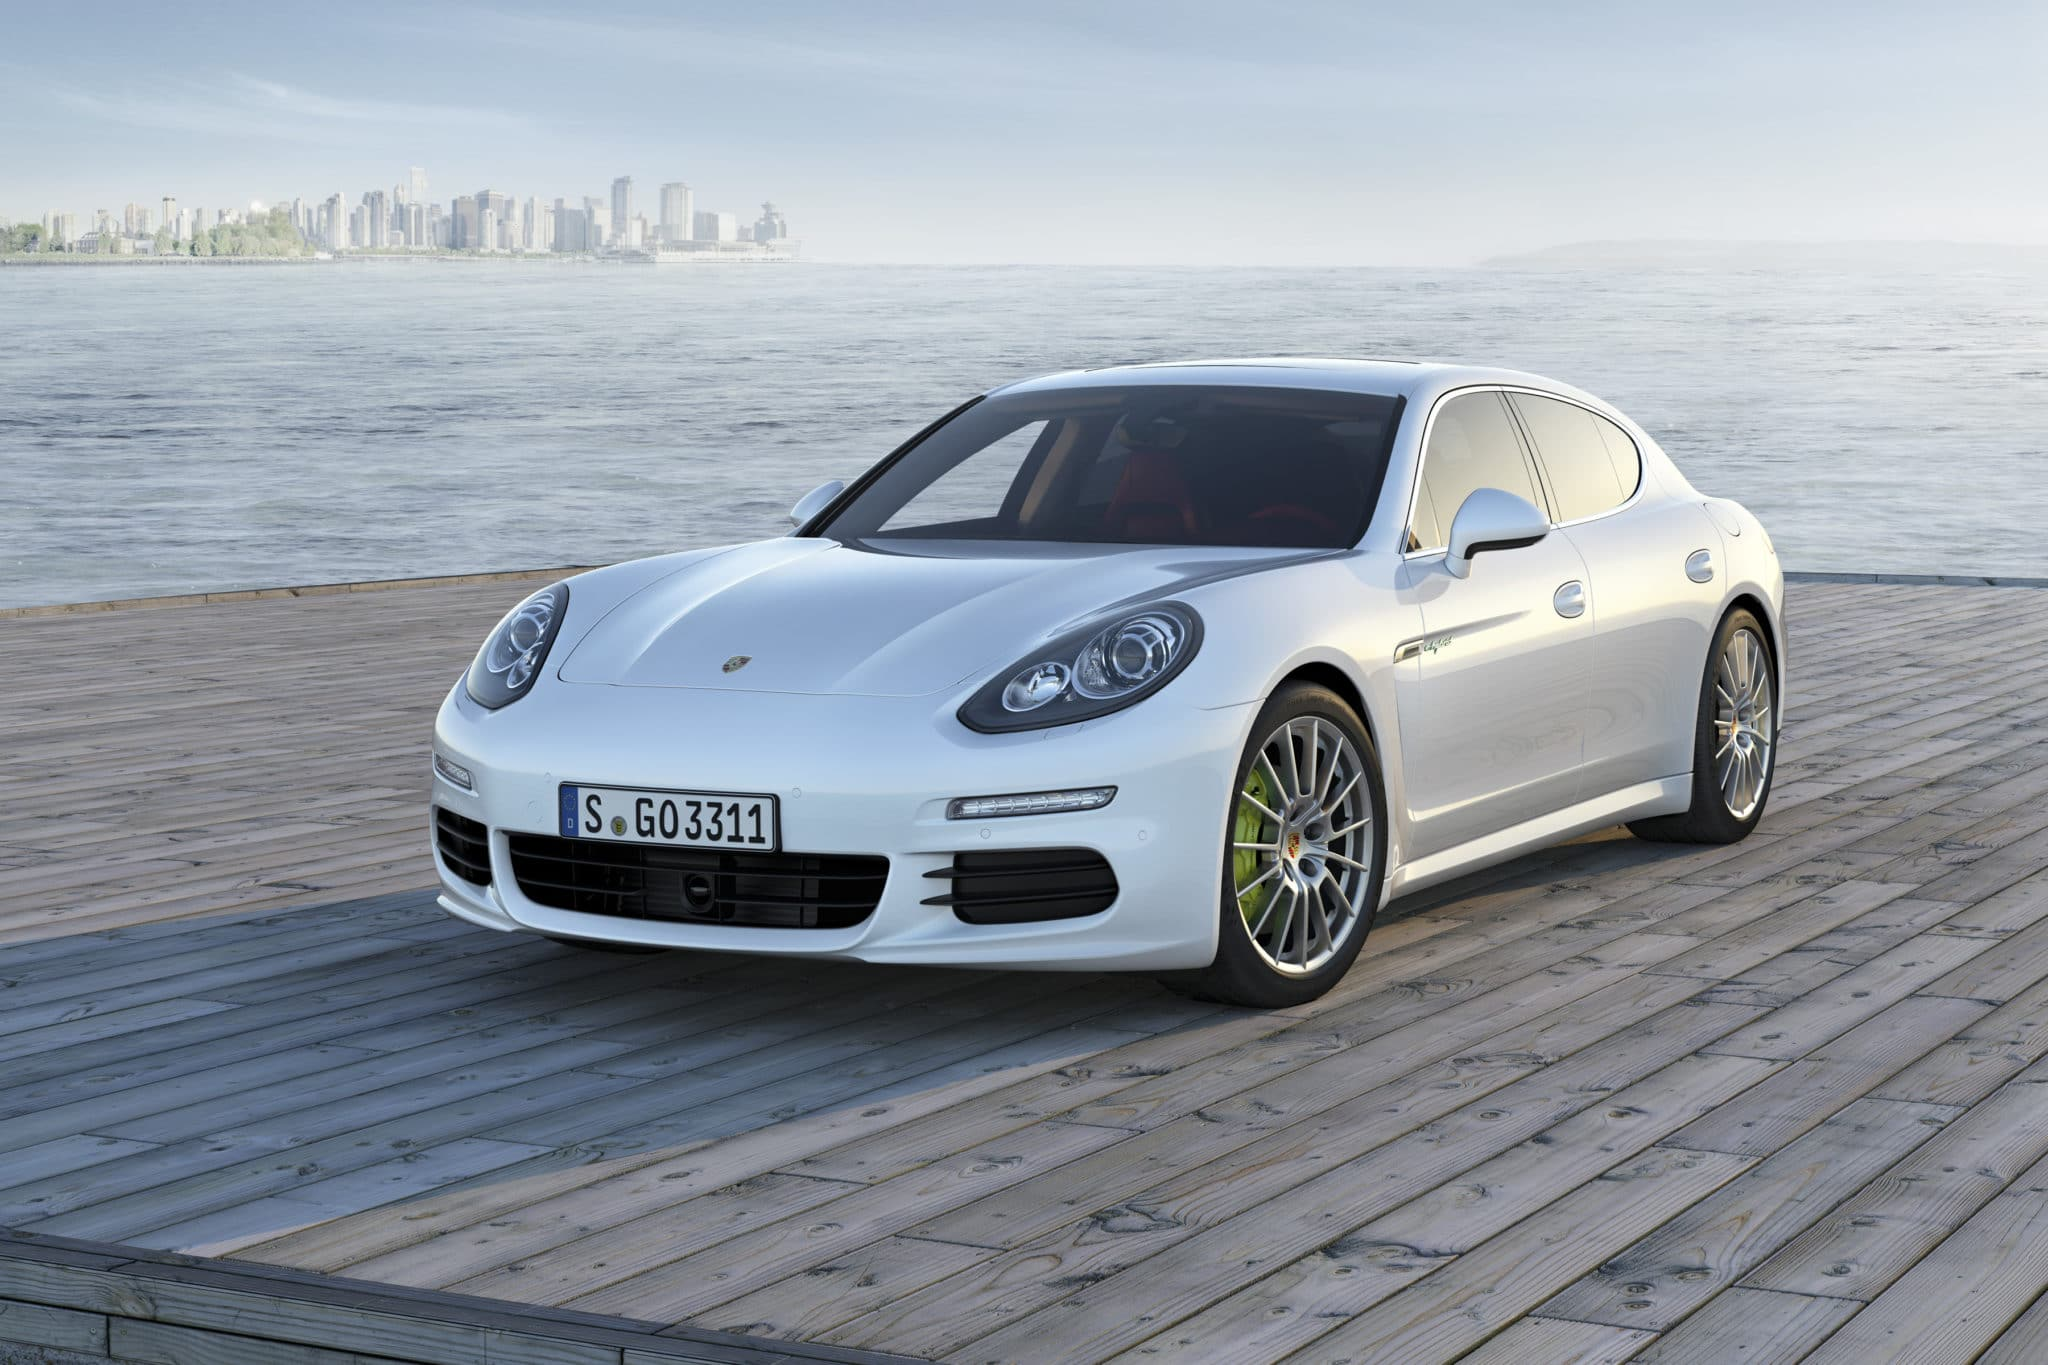 Porsche Panamera S e Panamera 4S E-Hybrid